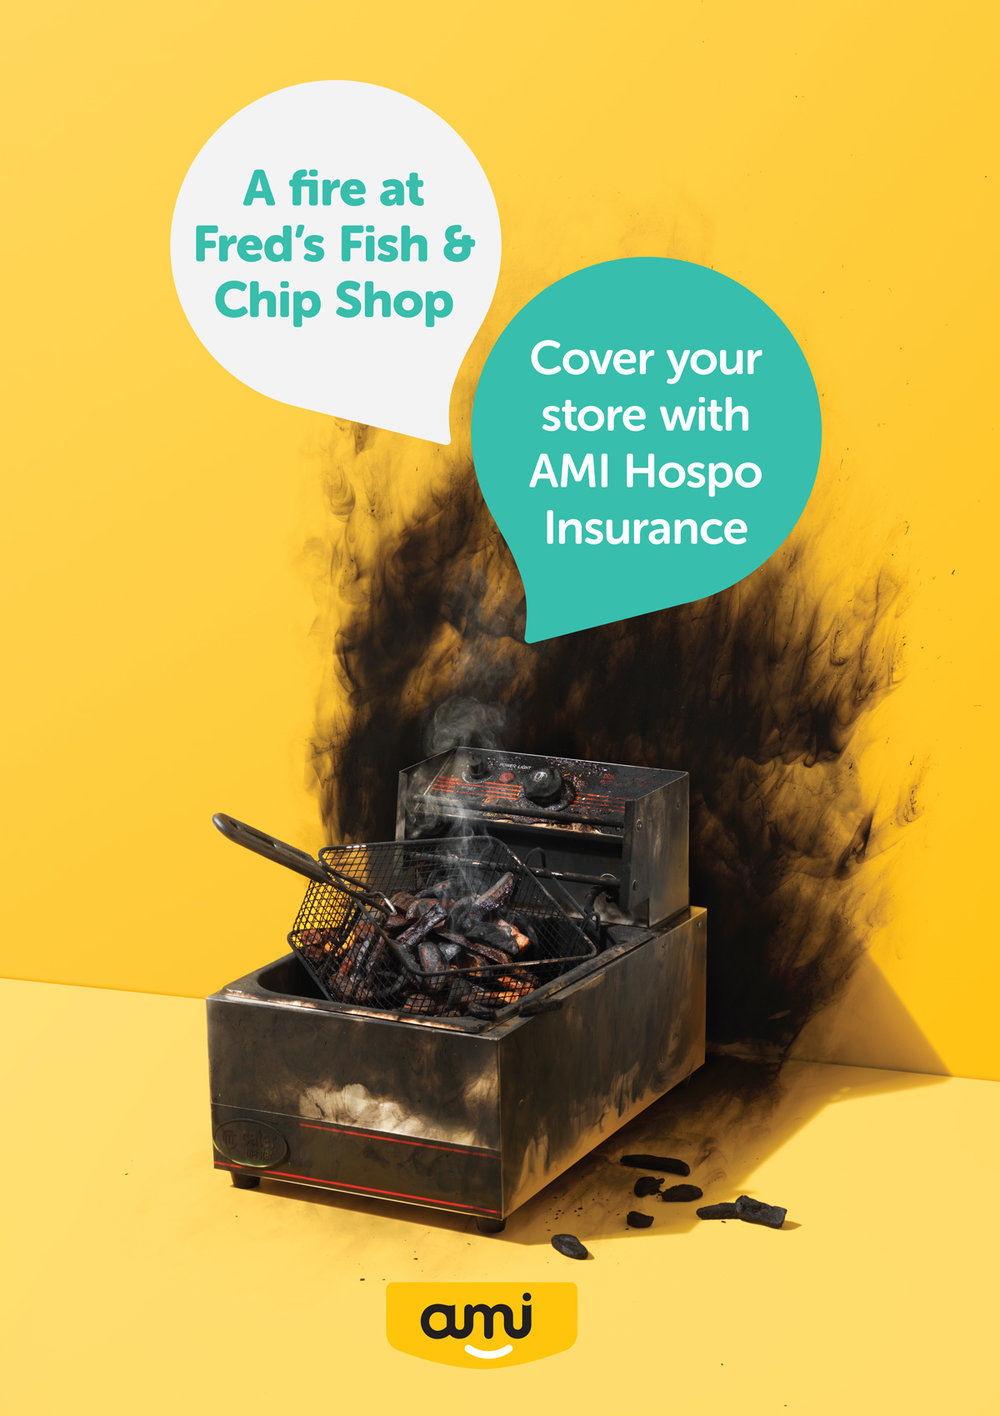 AMI1303-Hospo-Insurance_Instore-CF-1.jpg